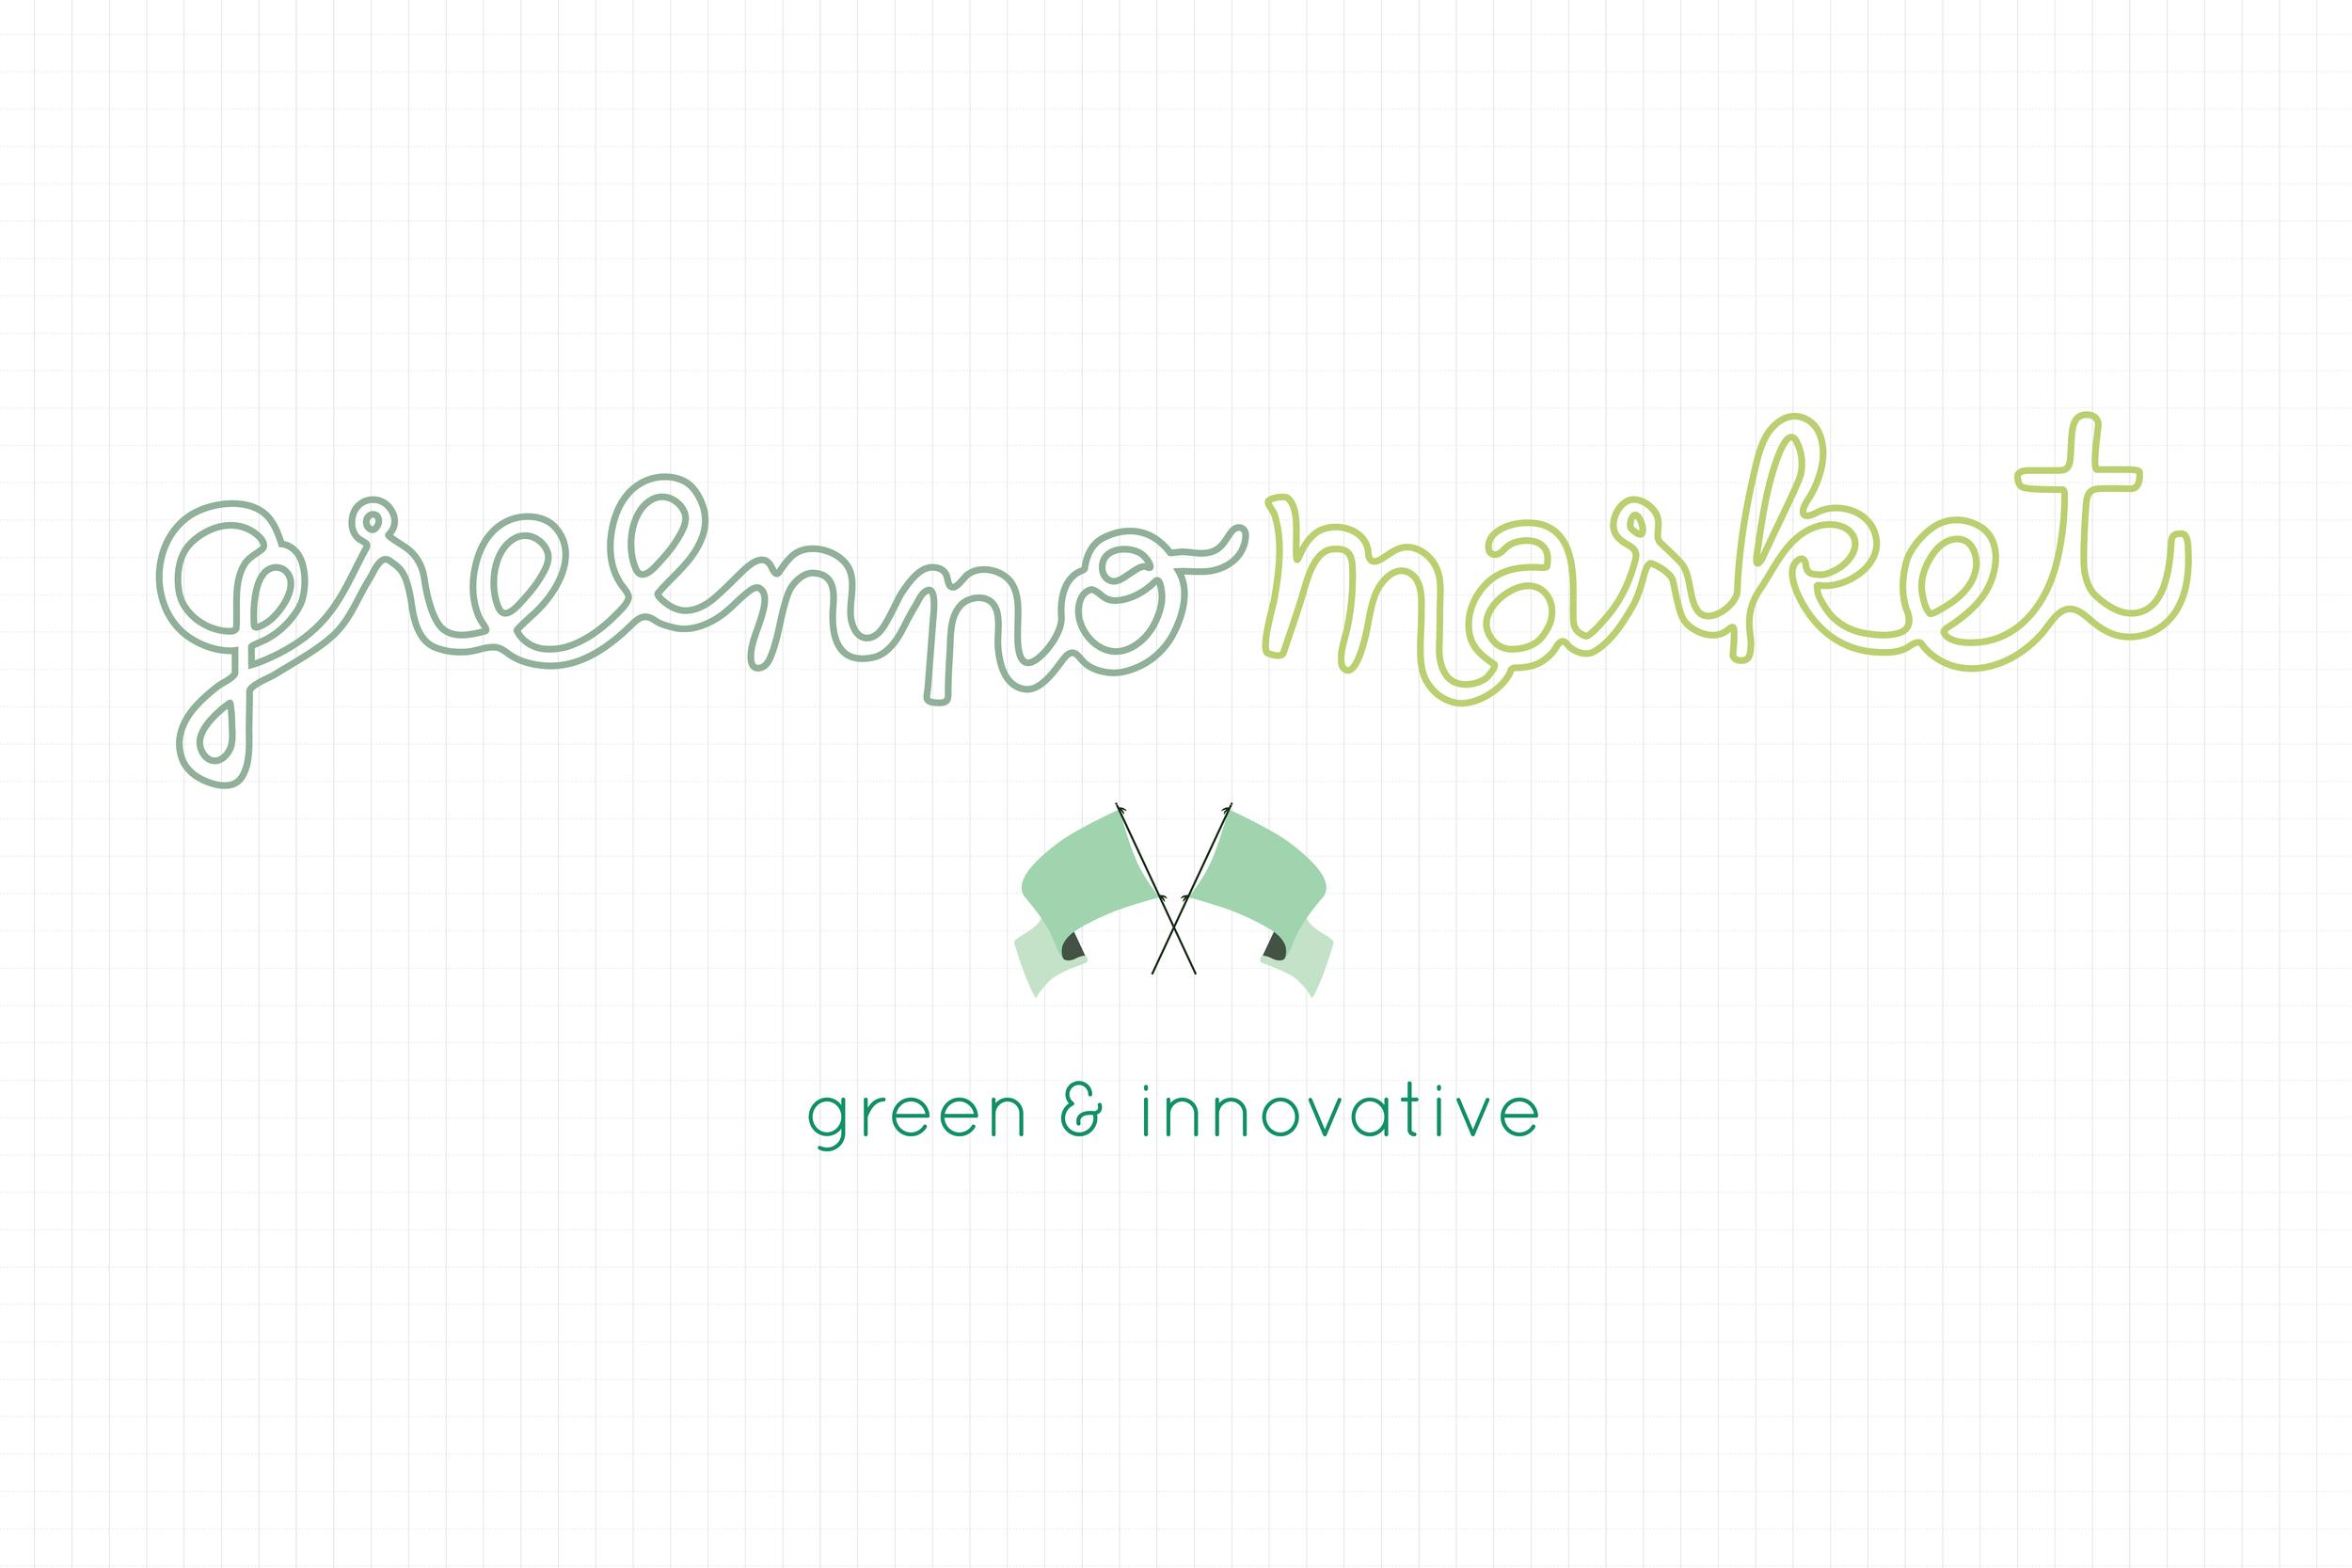 EVENT & GRAPHIC DESIGN FOR GREENNOMARKET - 2015